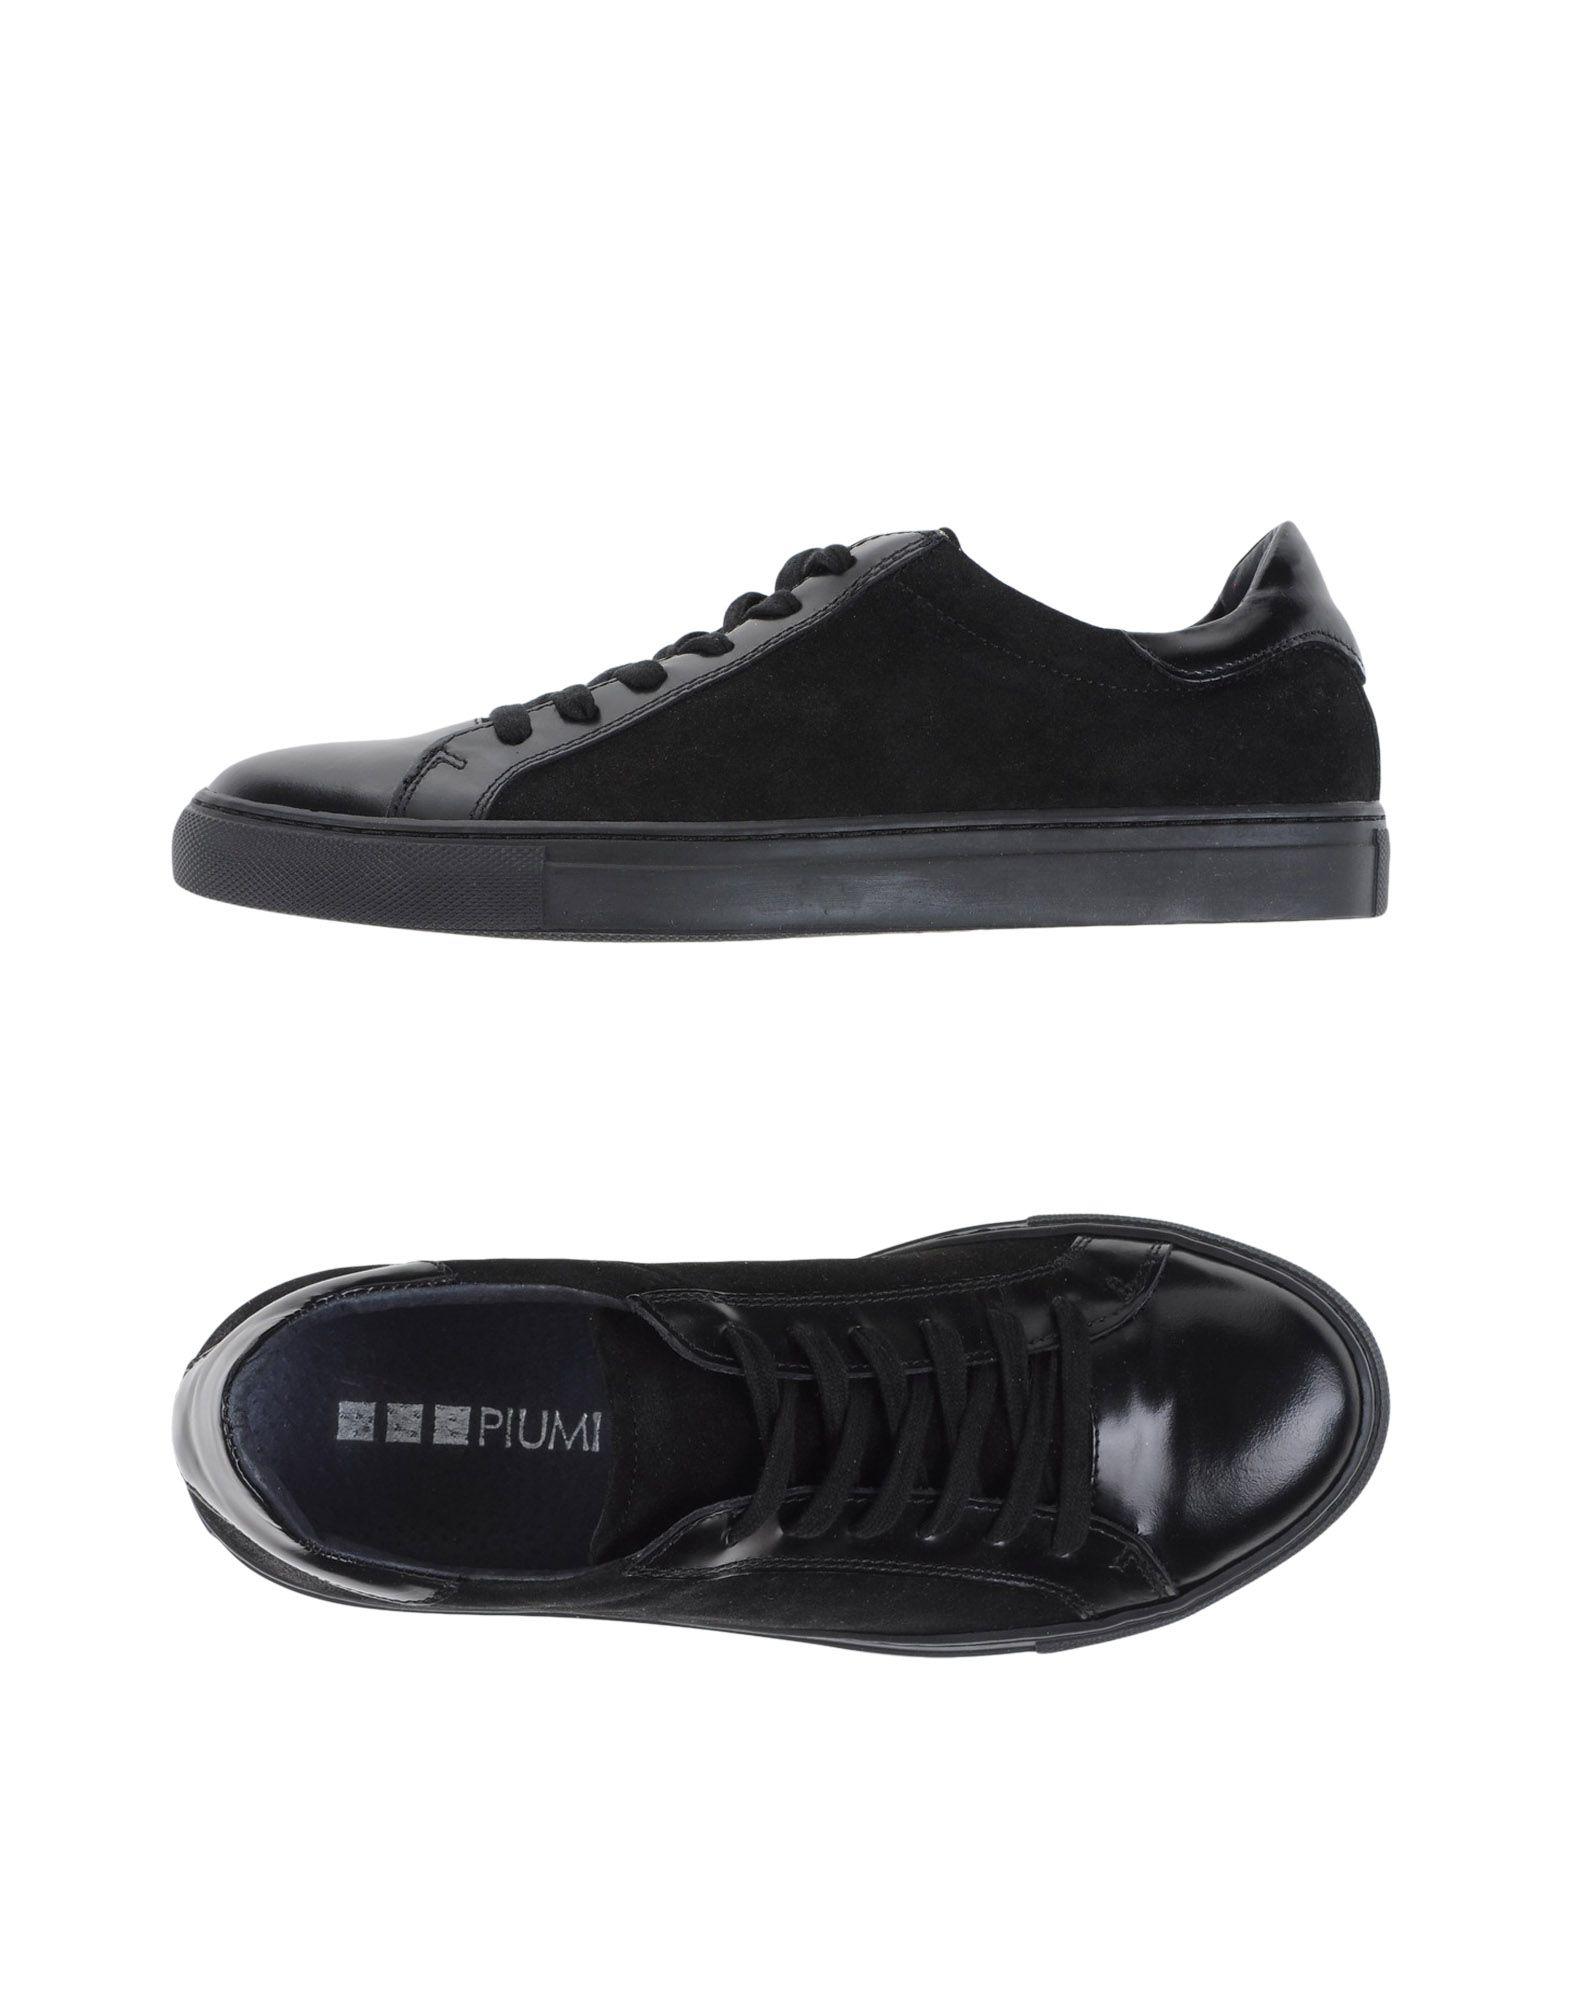 FOOTWEAR - Low-tops & sneakers Piumi Nvuw5sJTk8